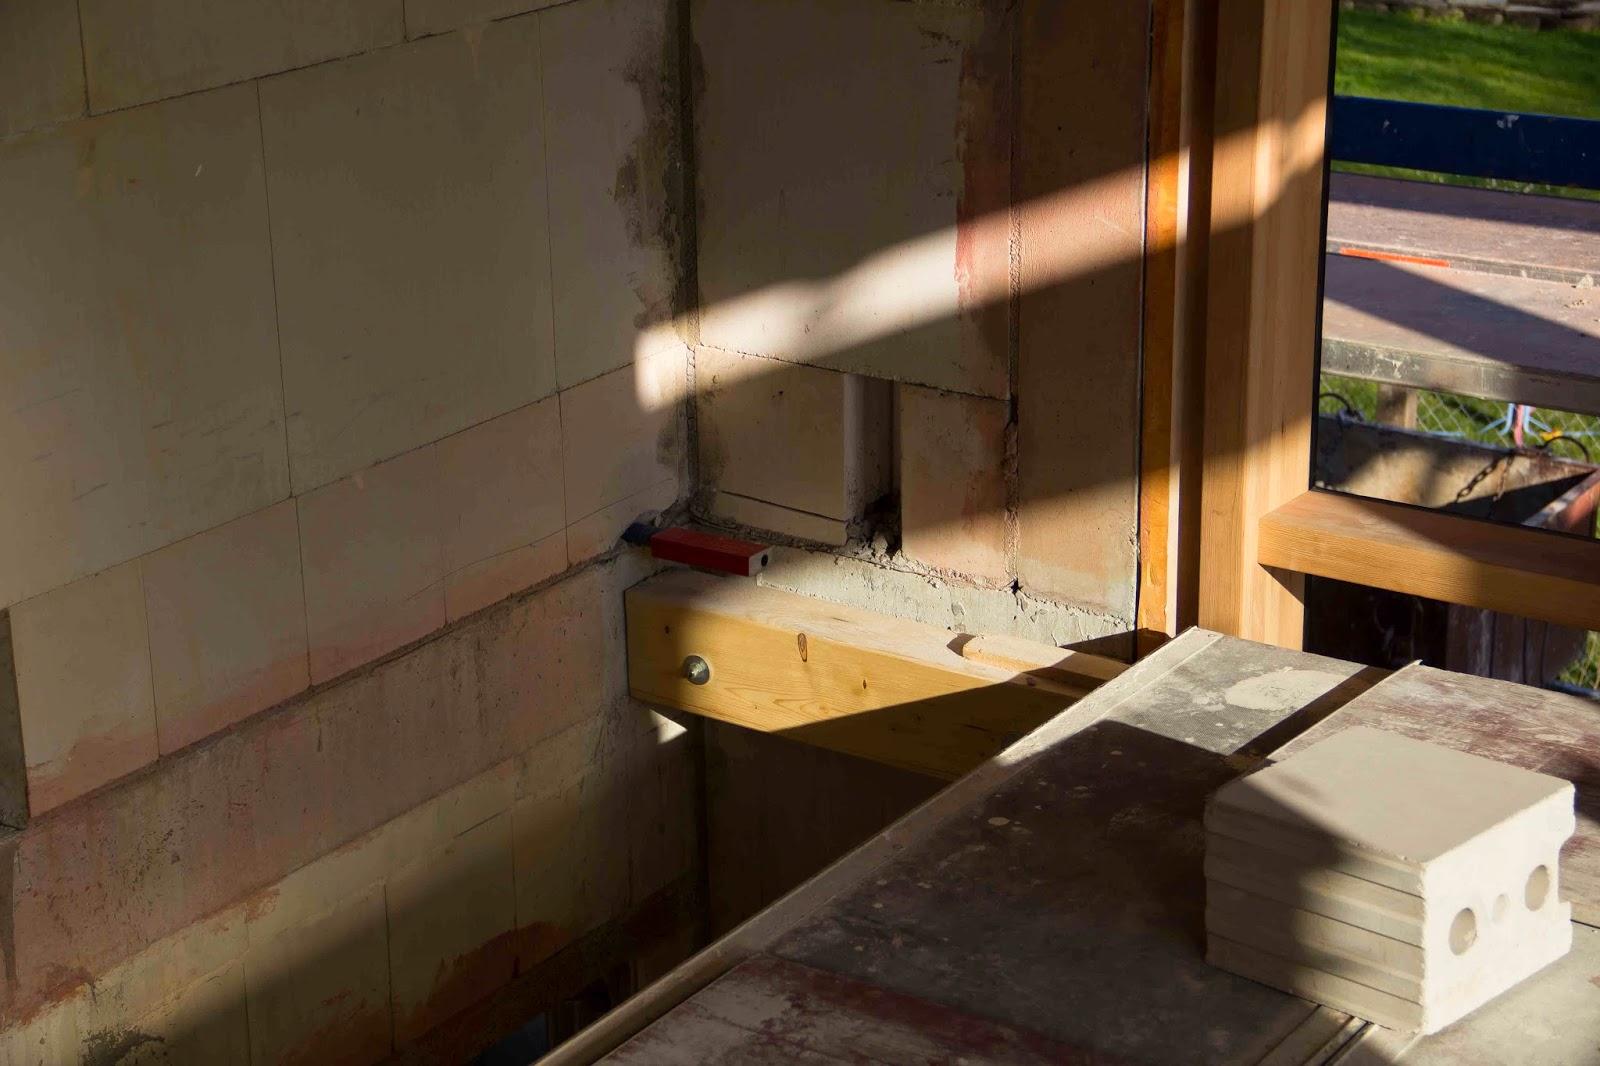 Flederhaus treppenhaus bereit f r gipser - Fenster fur treppenhaus ...